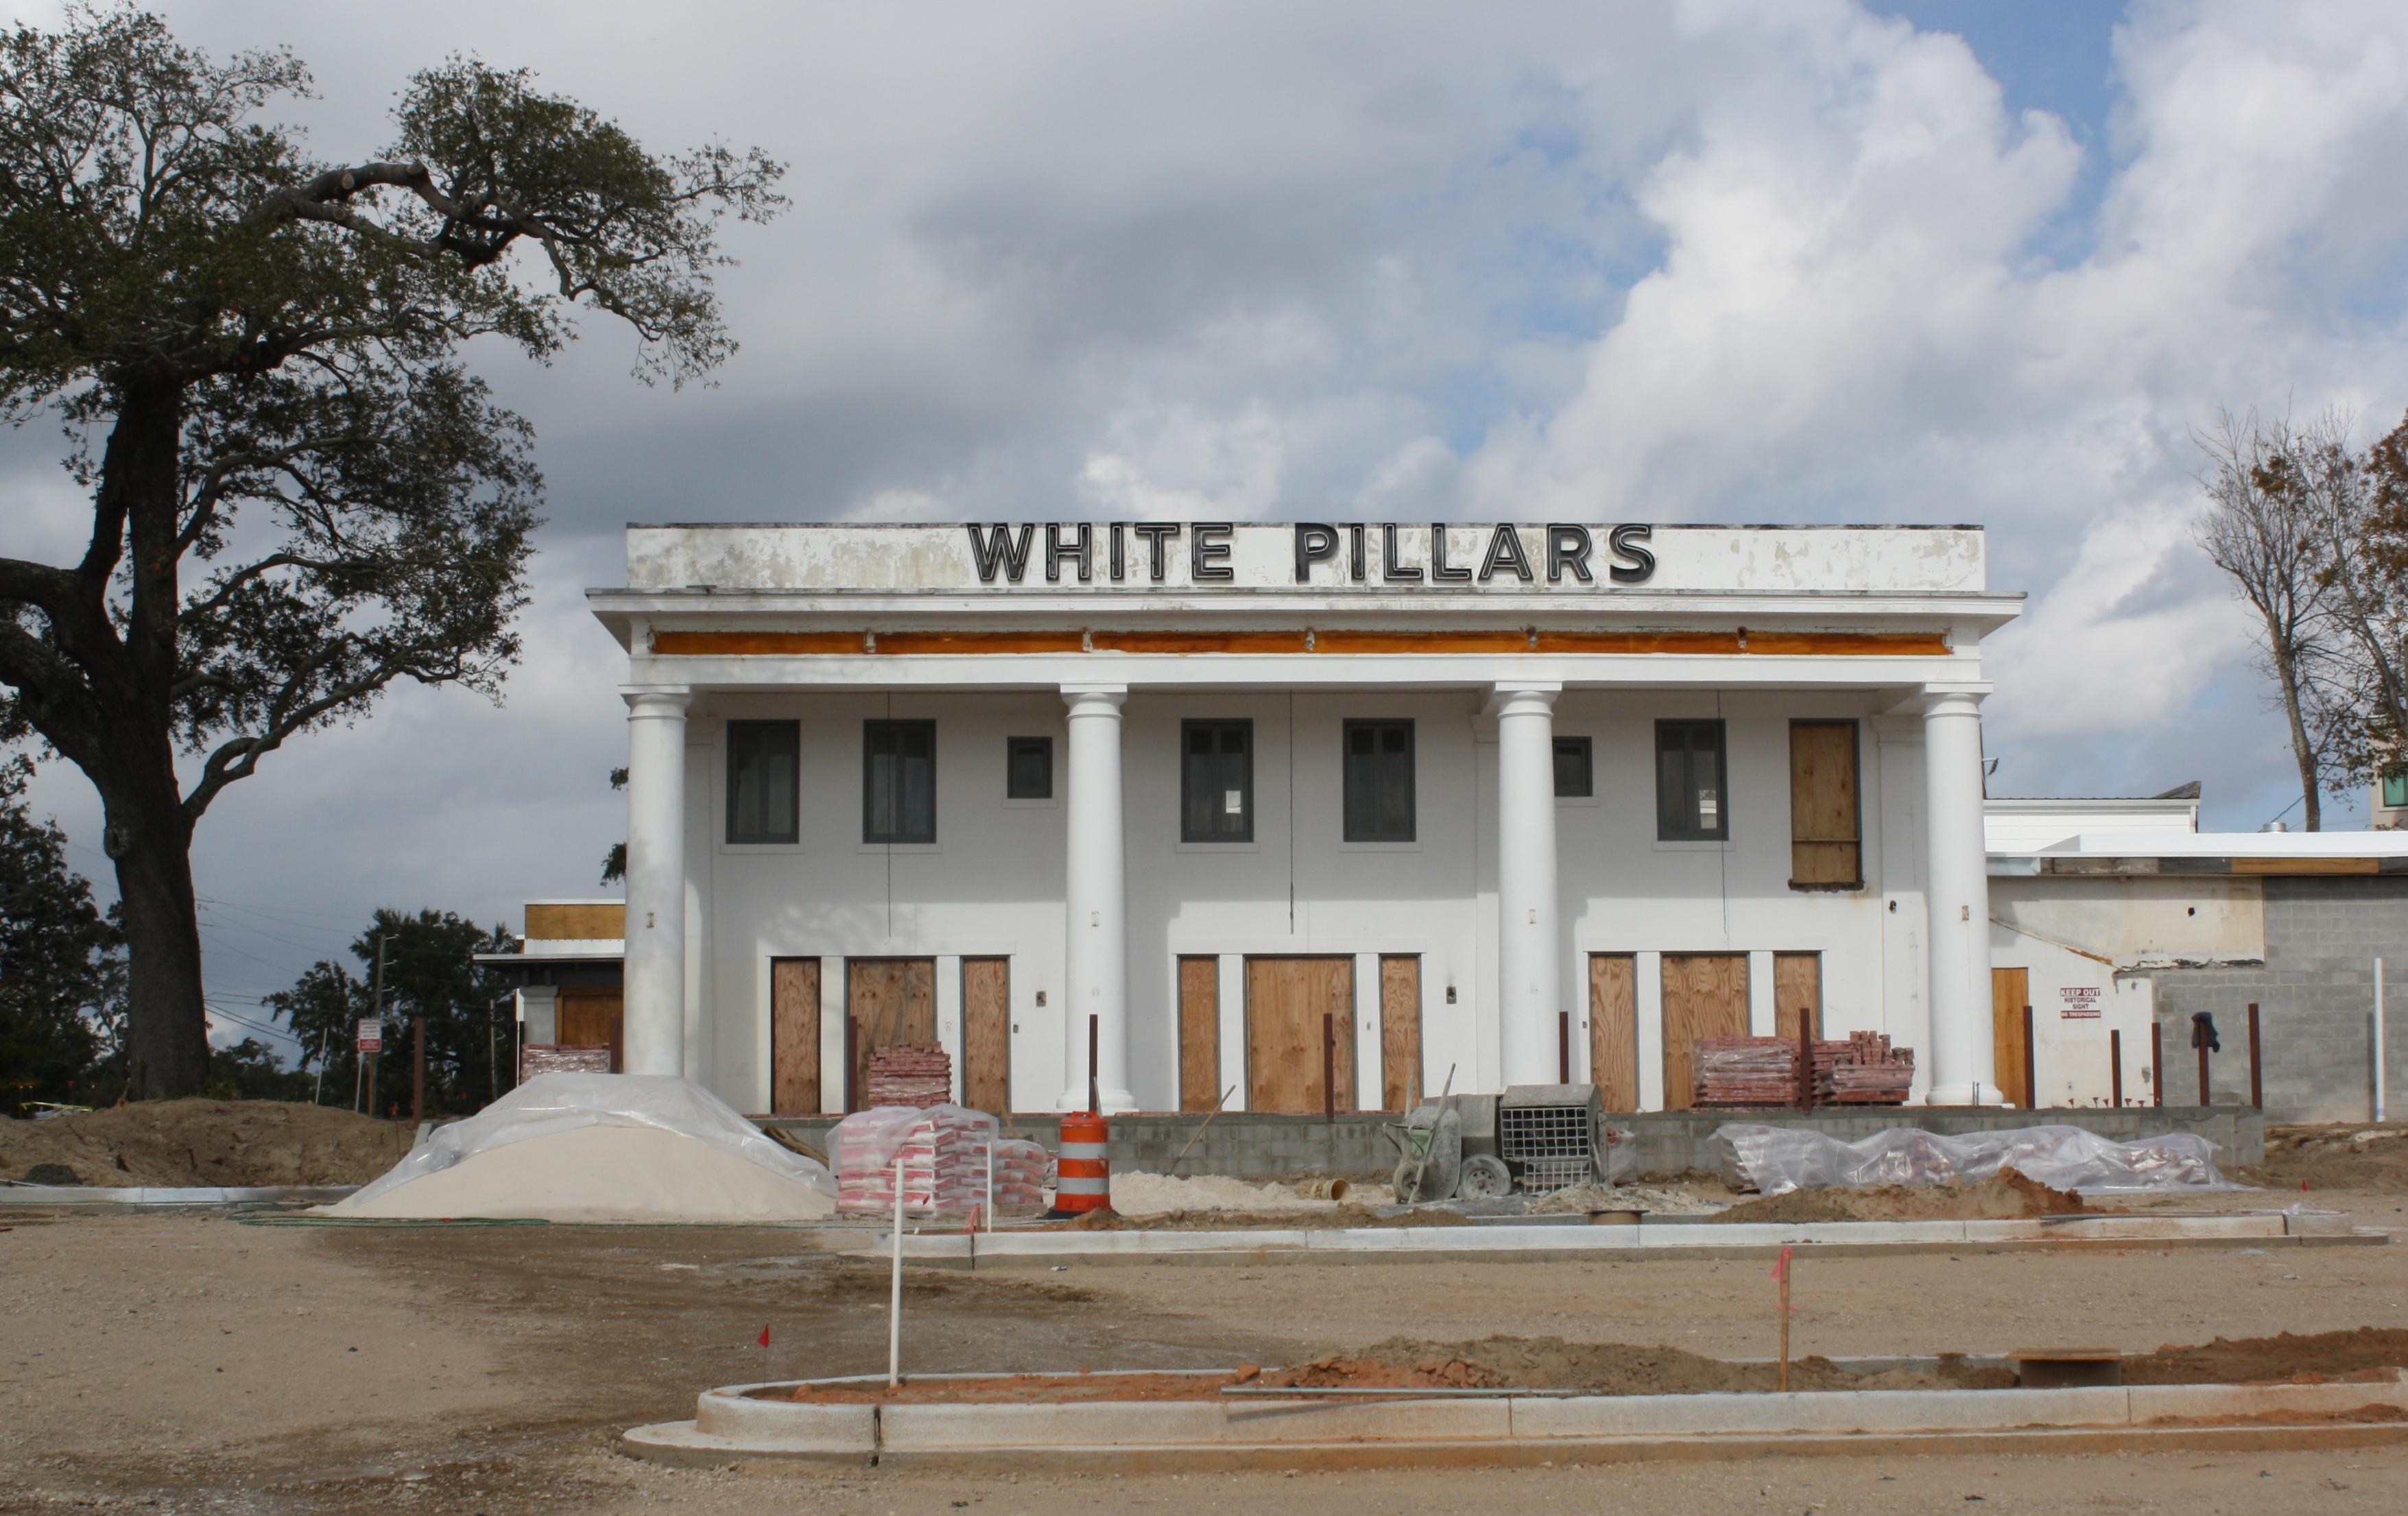 3 South Elevation White Pillars Restaurant Biloxi Ms Nov